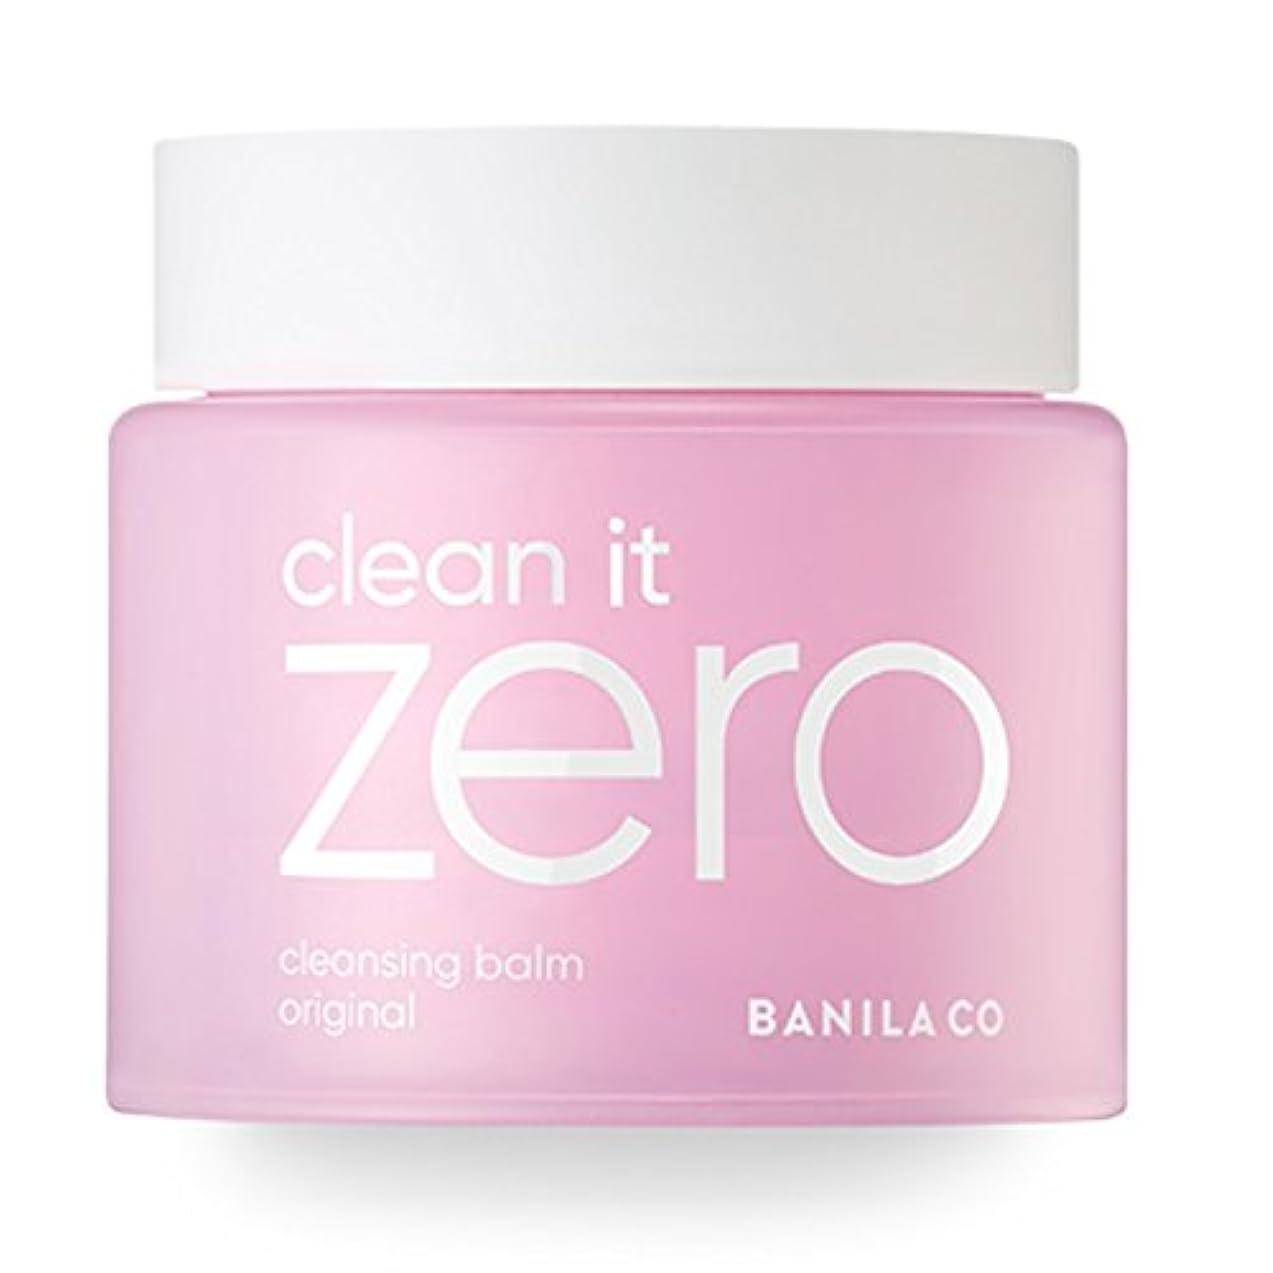 [banila co.] Clean It Zero 100ml (sherbet cleanser) (Clean It Zero Ultra Size 180ml (Original))